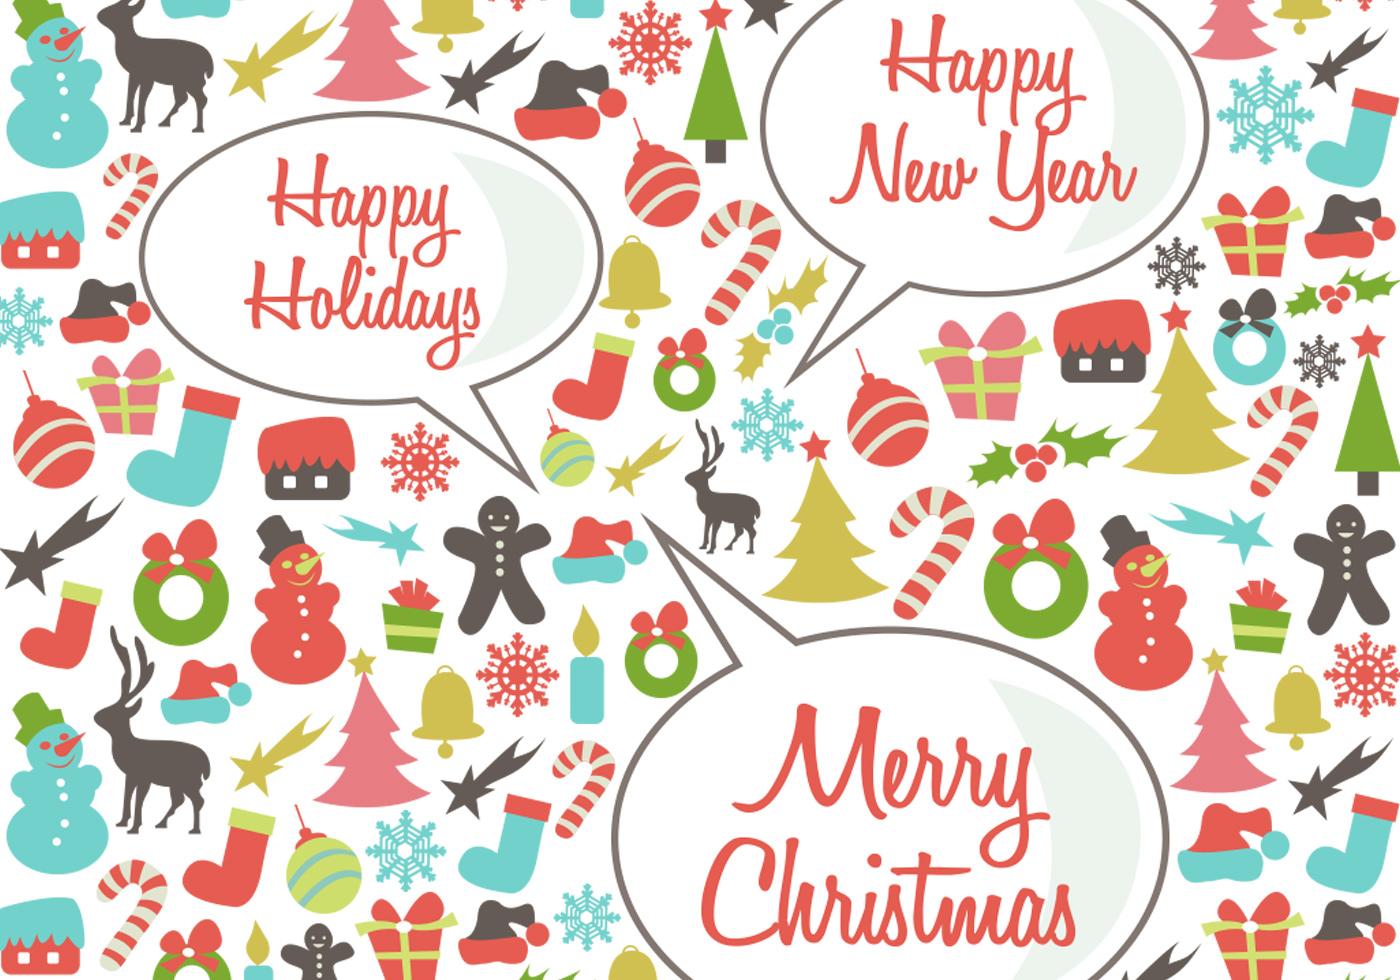 Wallpaper Happy Holidays Hd Celebrations Christmas 5116: Retro Happy Holidays PSD Background